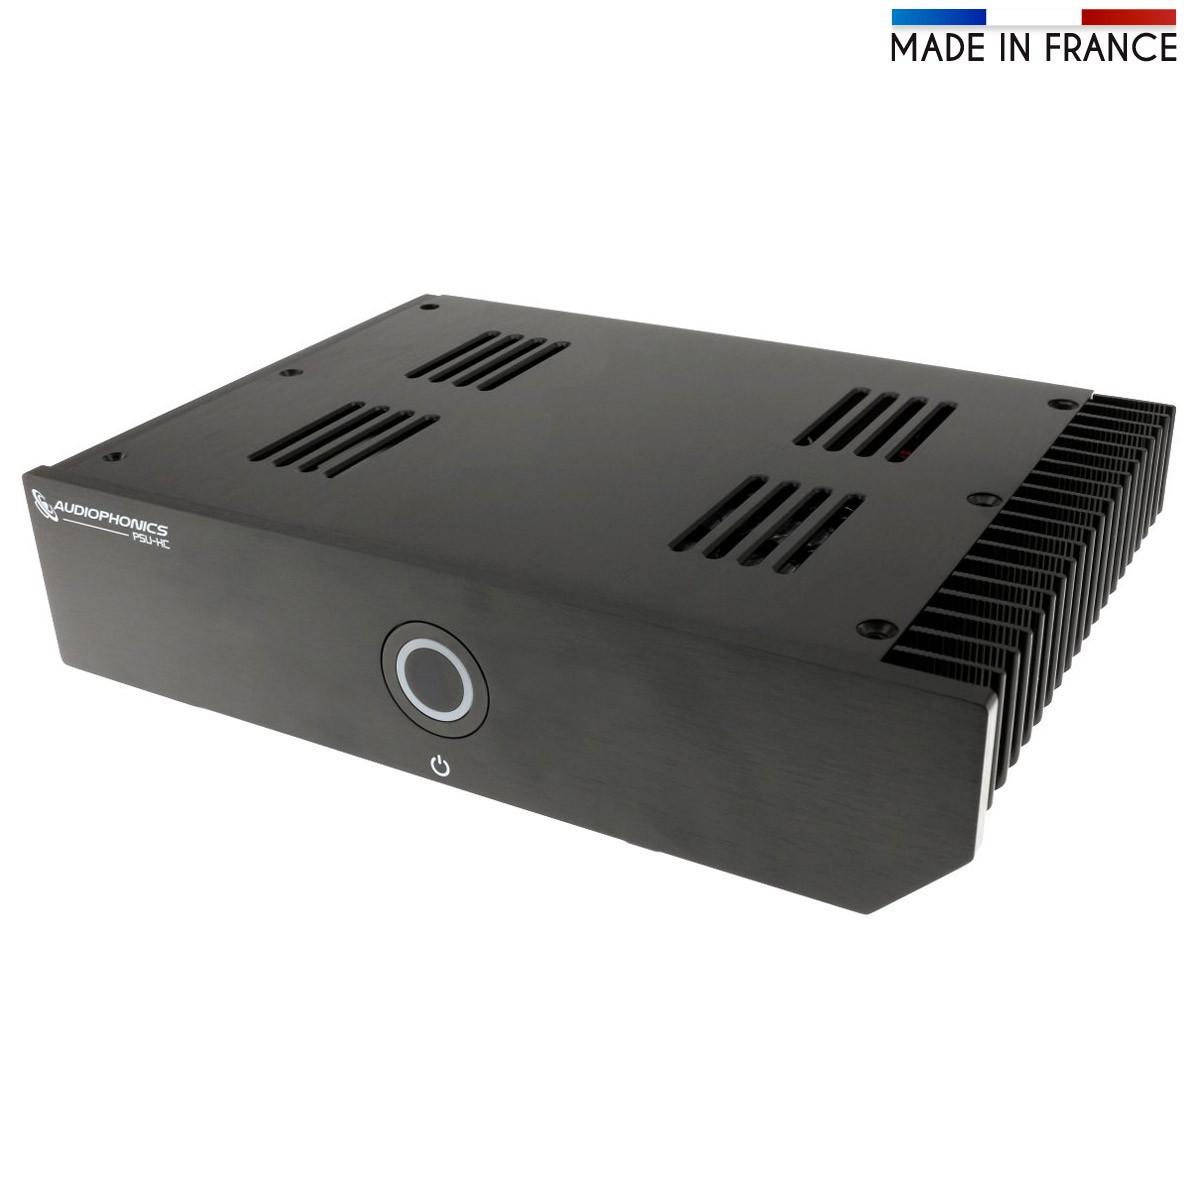 AUDIOPHONICS PSU-HC Linear Power Supply for ifi Audio Pro iCAN 15V 5A 100VA